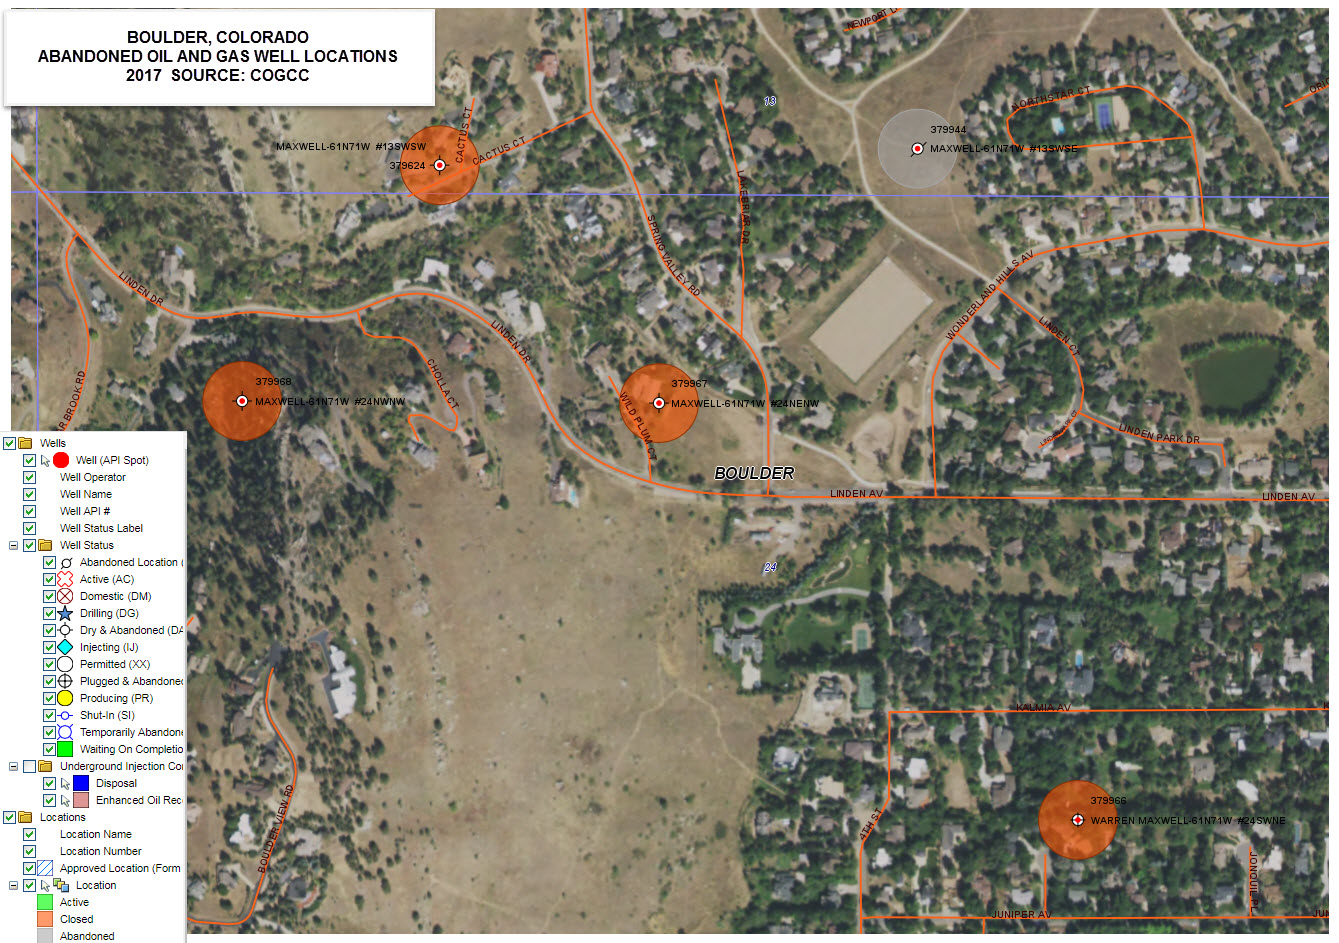 FRACTIVIST - Assist, Reform and Protect!: Boulder County: Abandoned